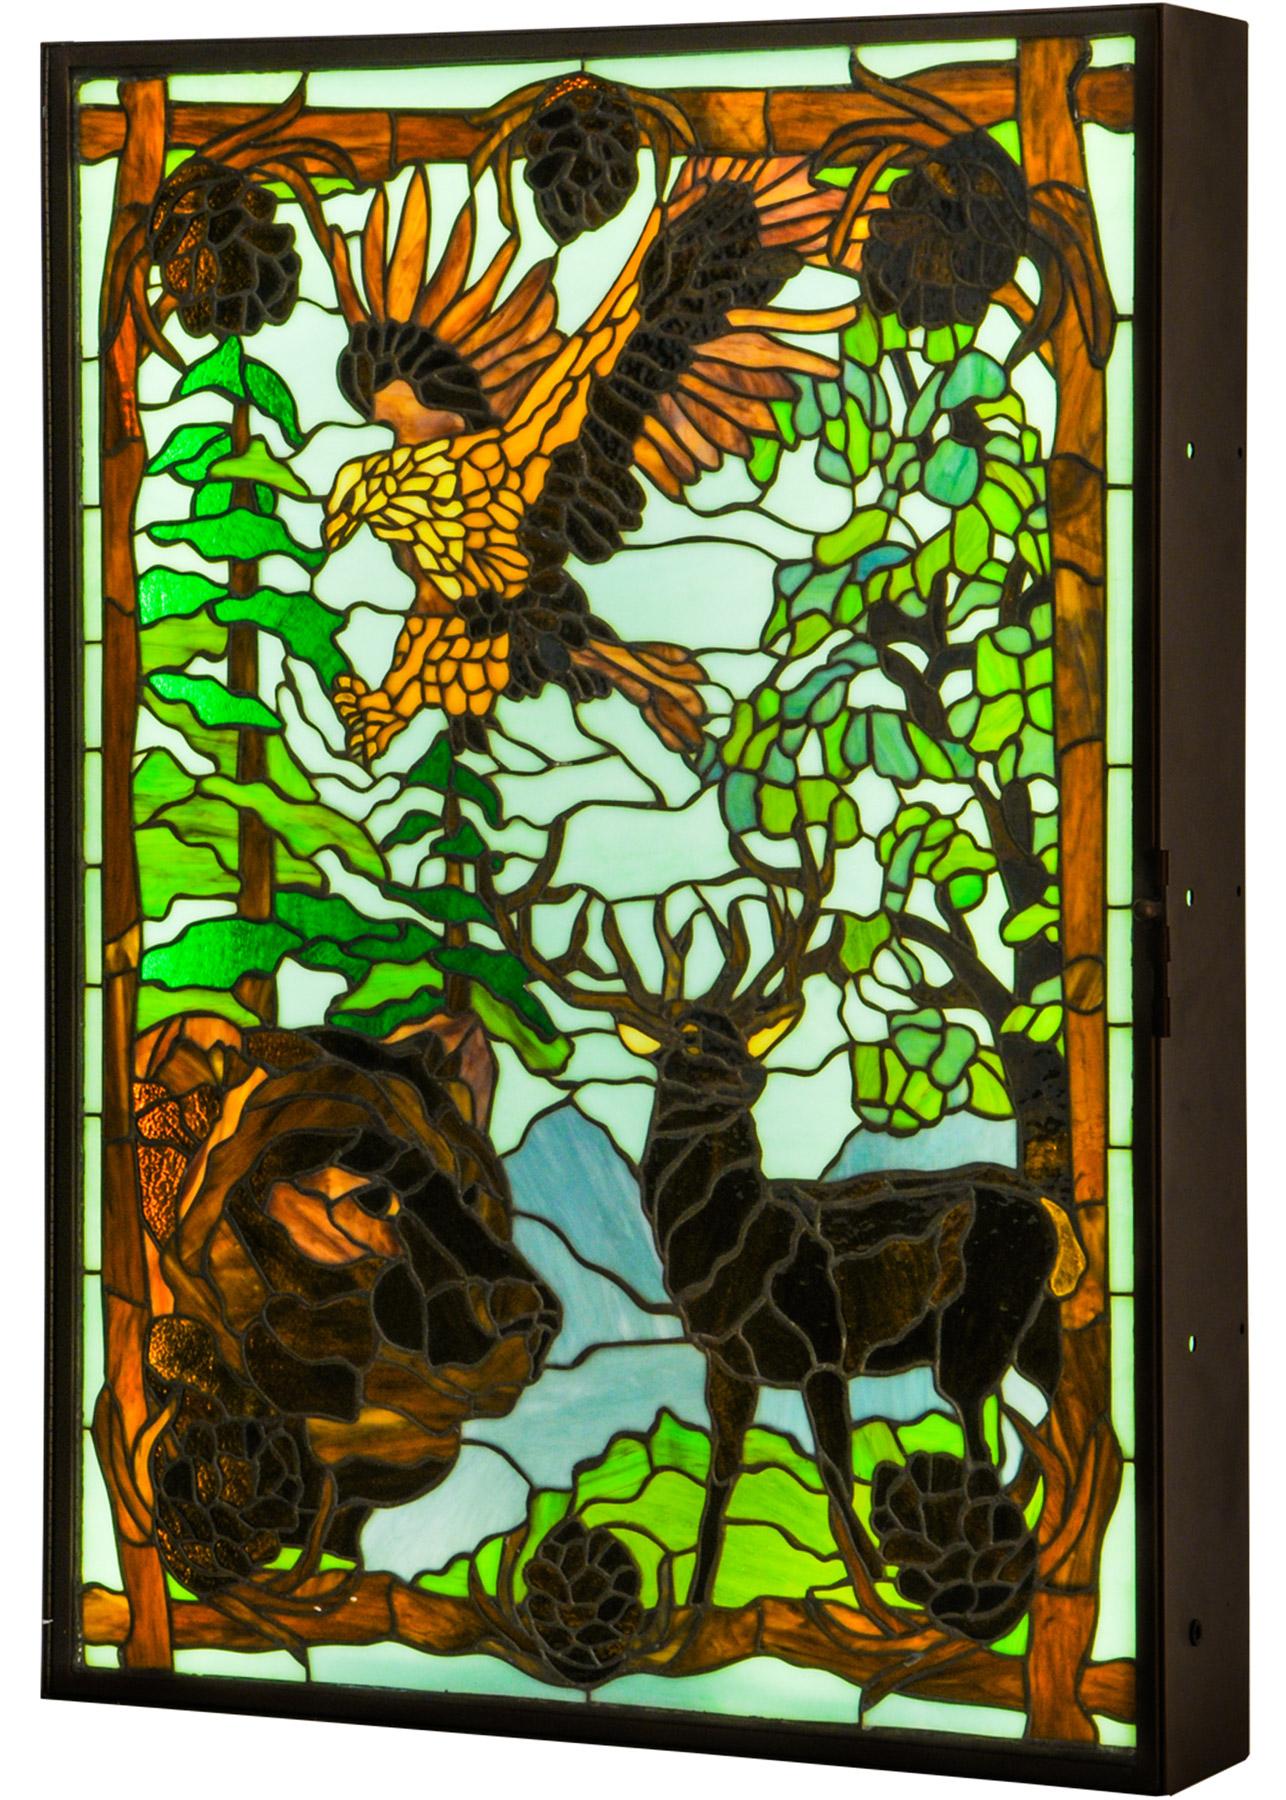 Meyda 149464 Wilderness Lighted Tiffany Dual Sided Led